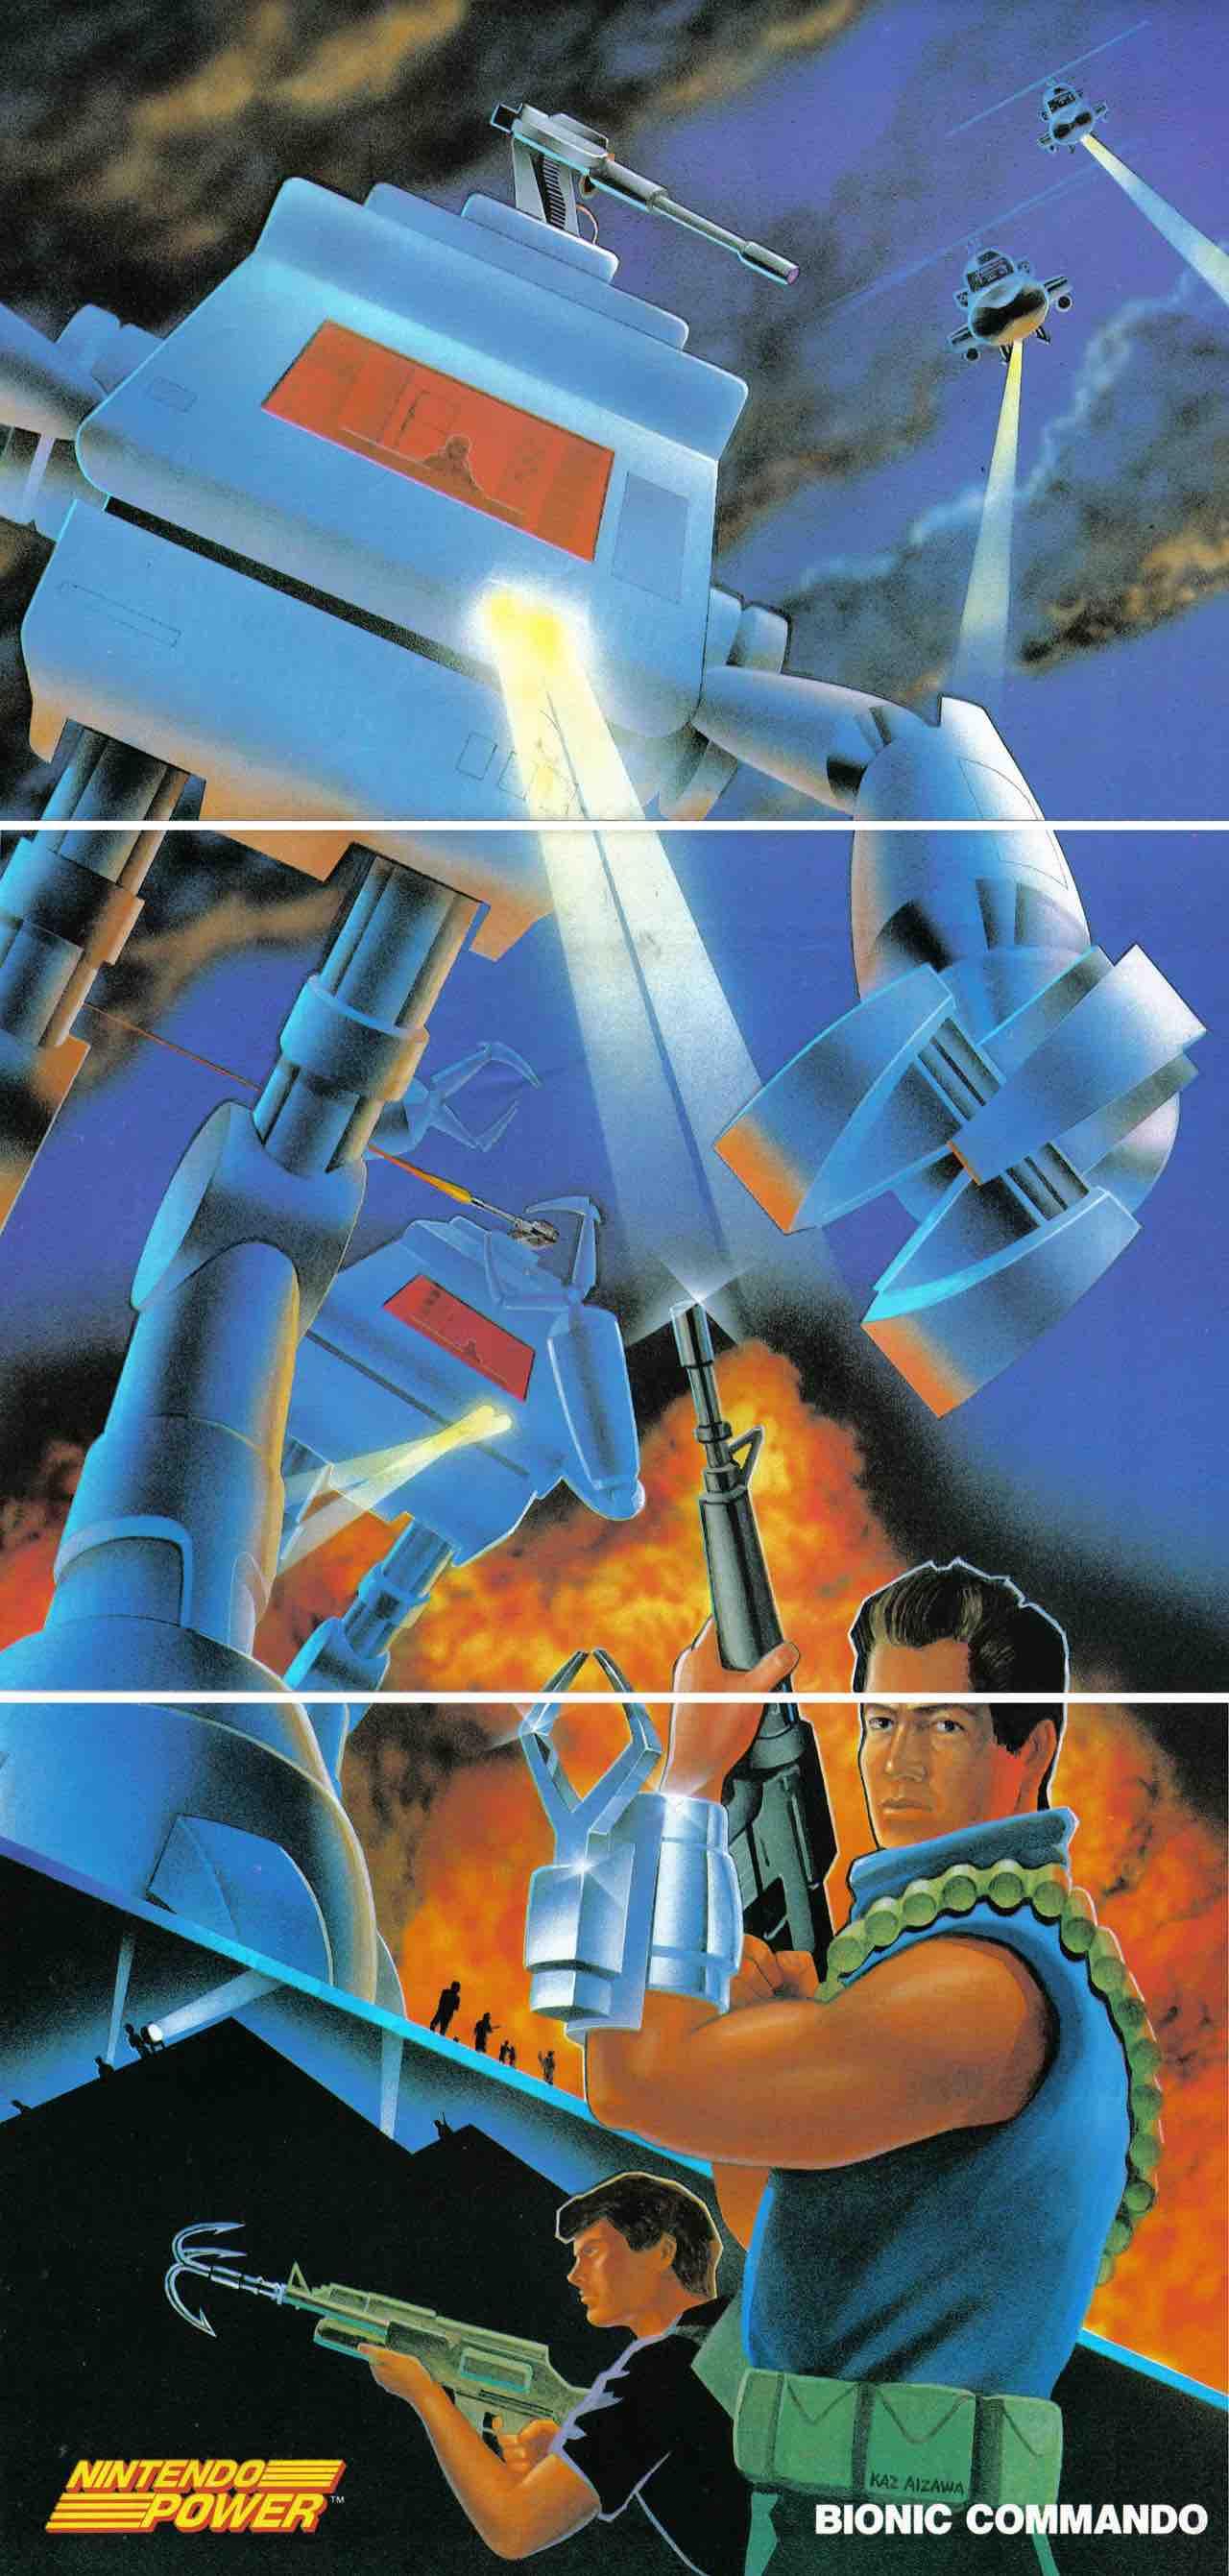 Nintendo Power   Sept Oct 1988-38-40